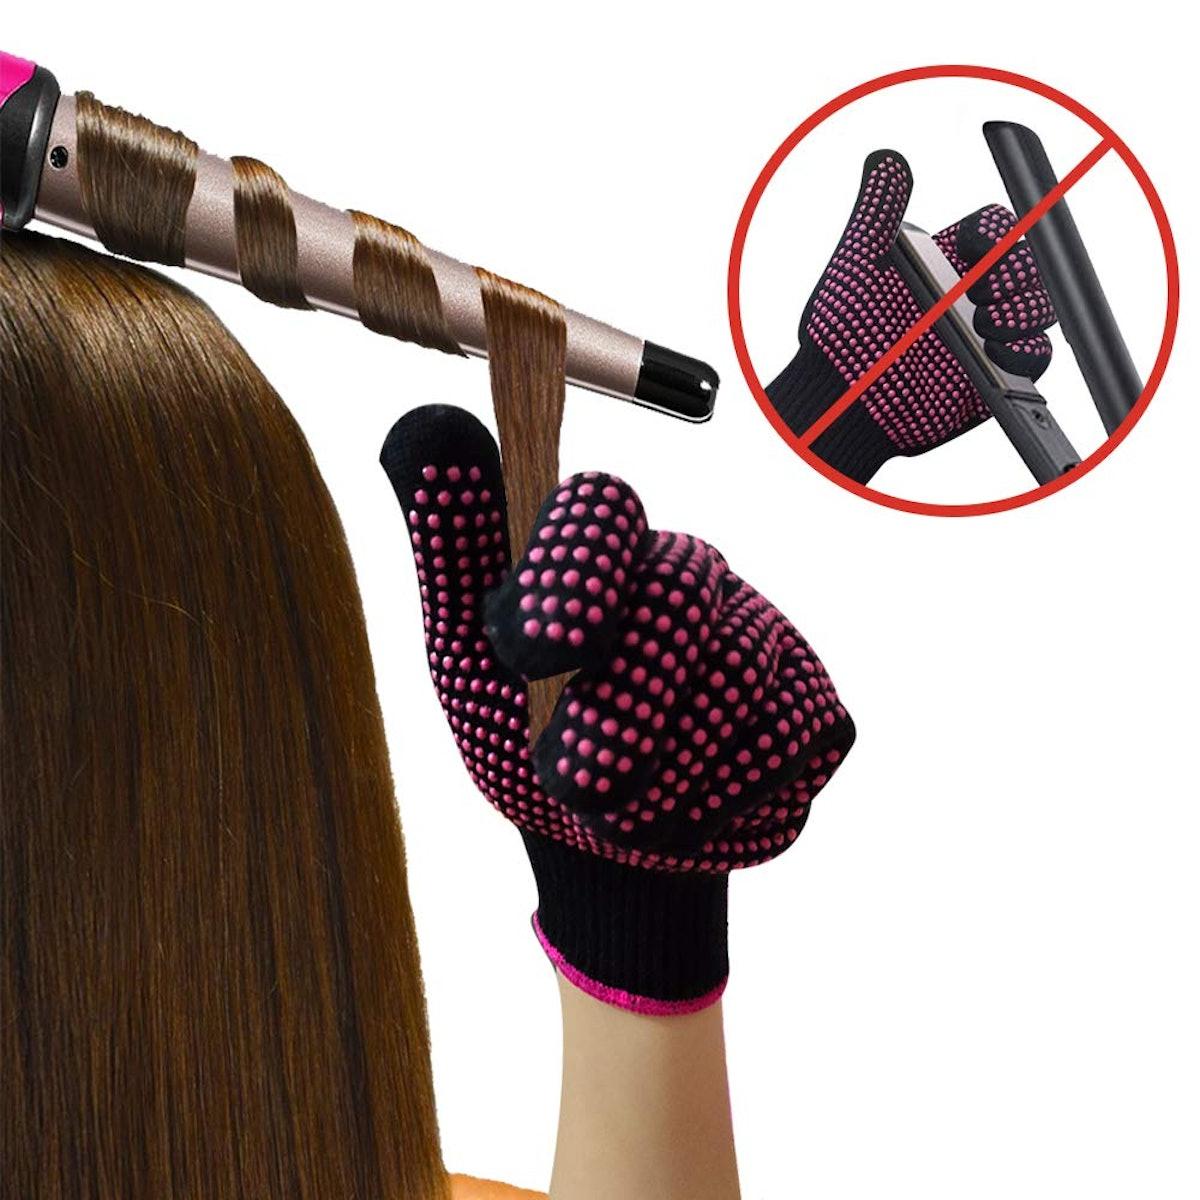 AFT90 Heat-Resistant Gloves (1 Pair)